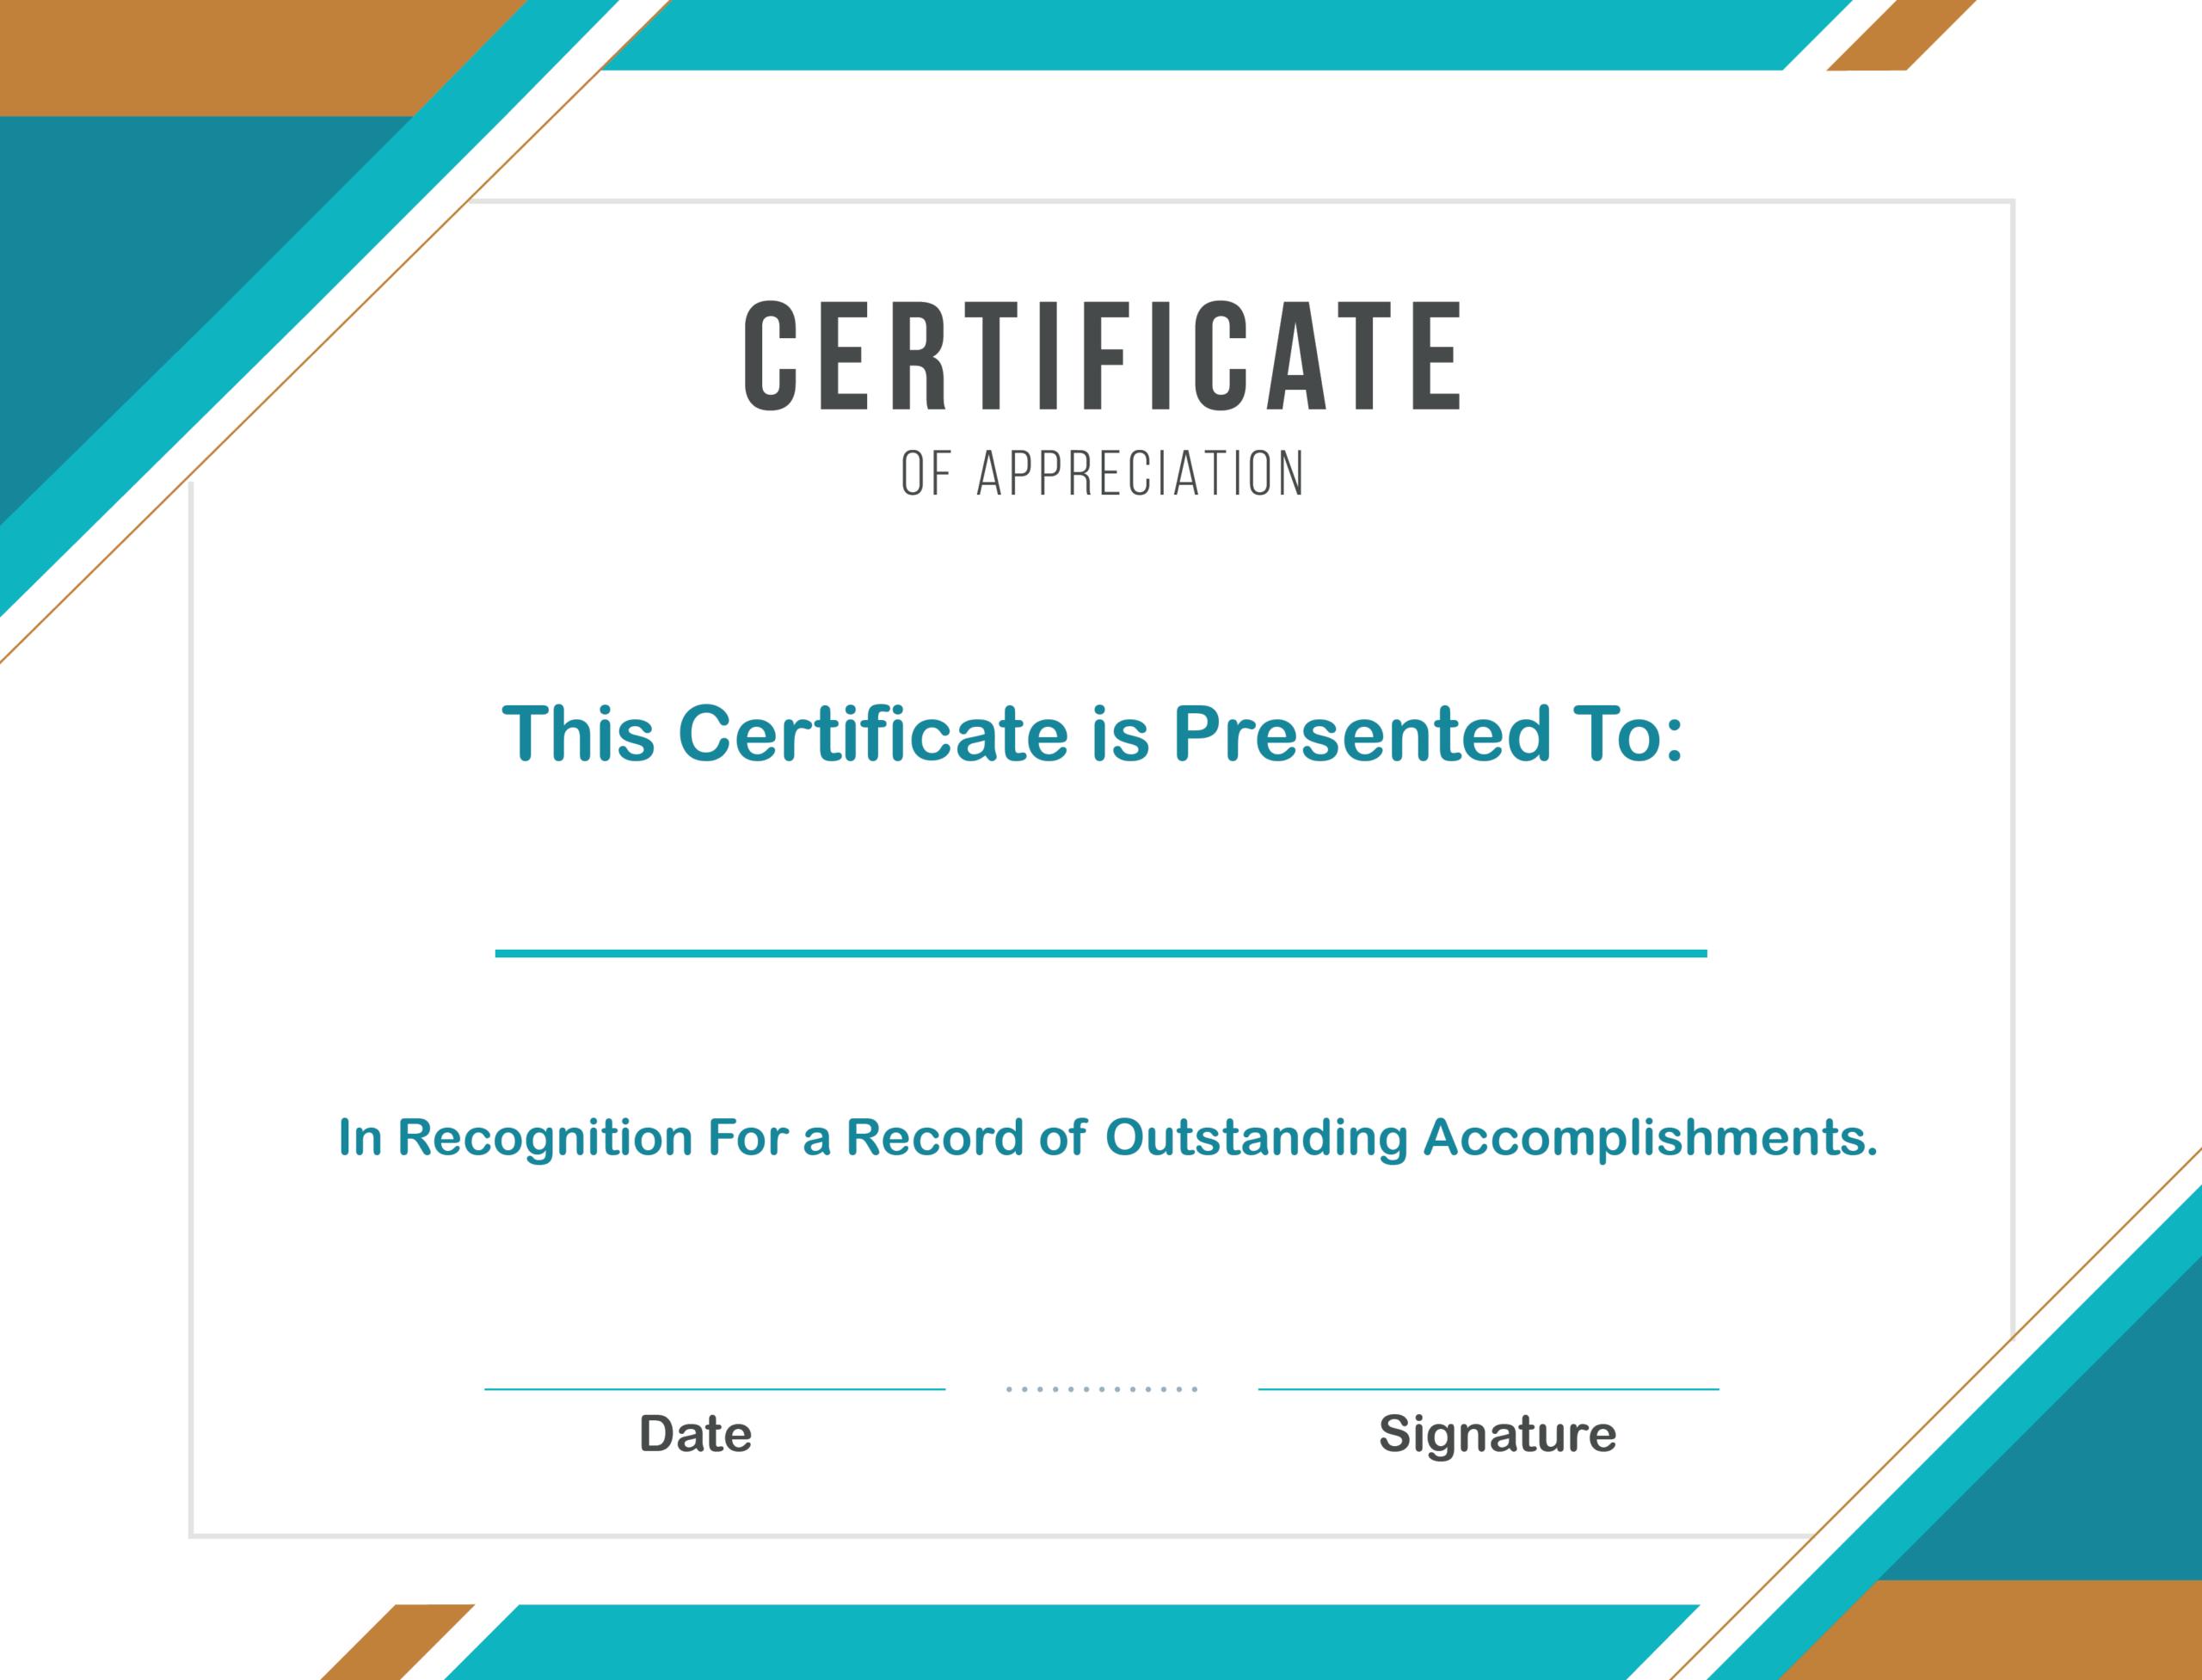 Free Sample Format Of Certificate Of Appreciation Template With Template For Certificate Of Award